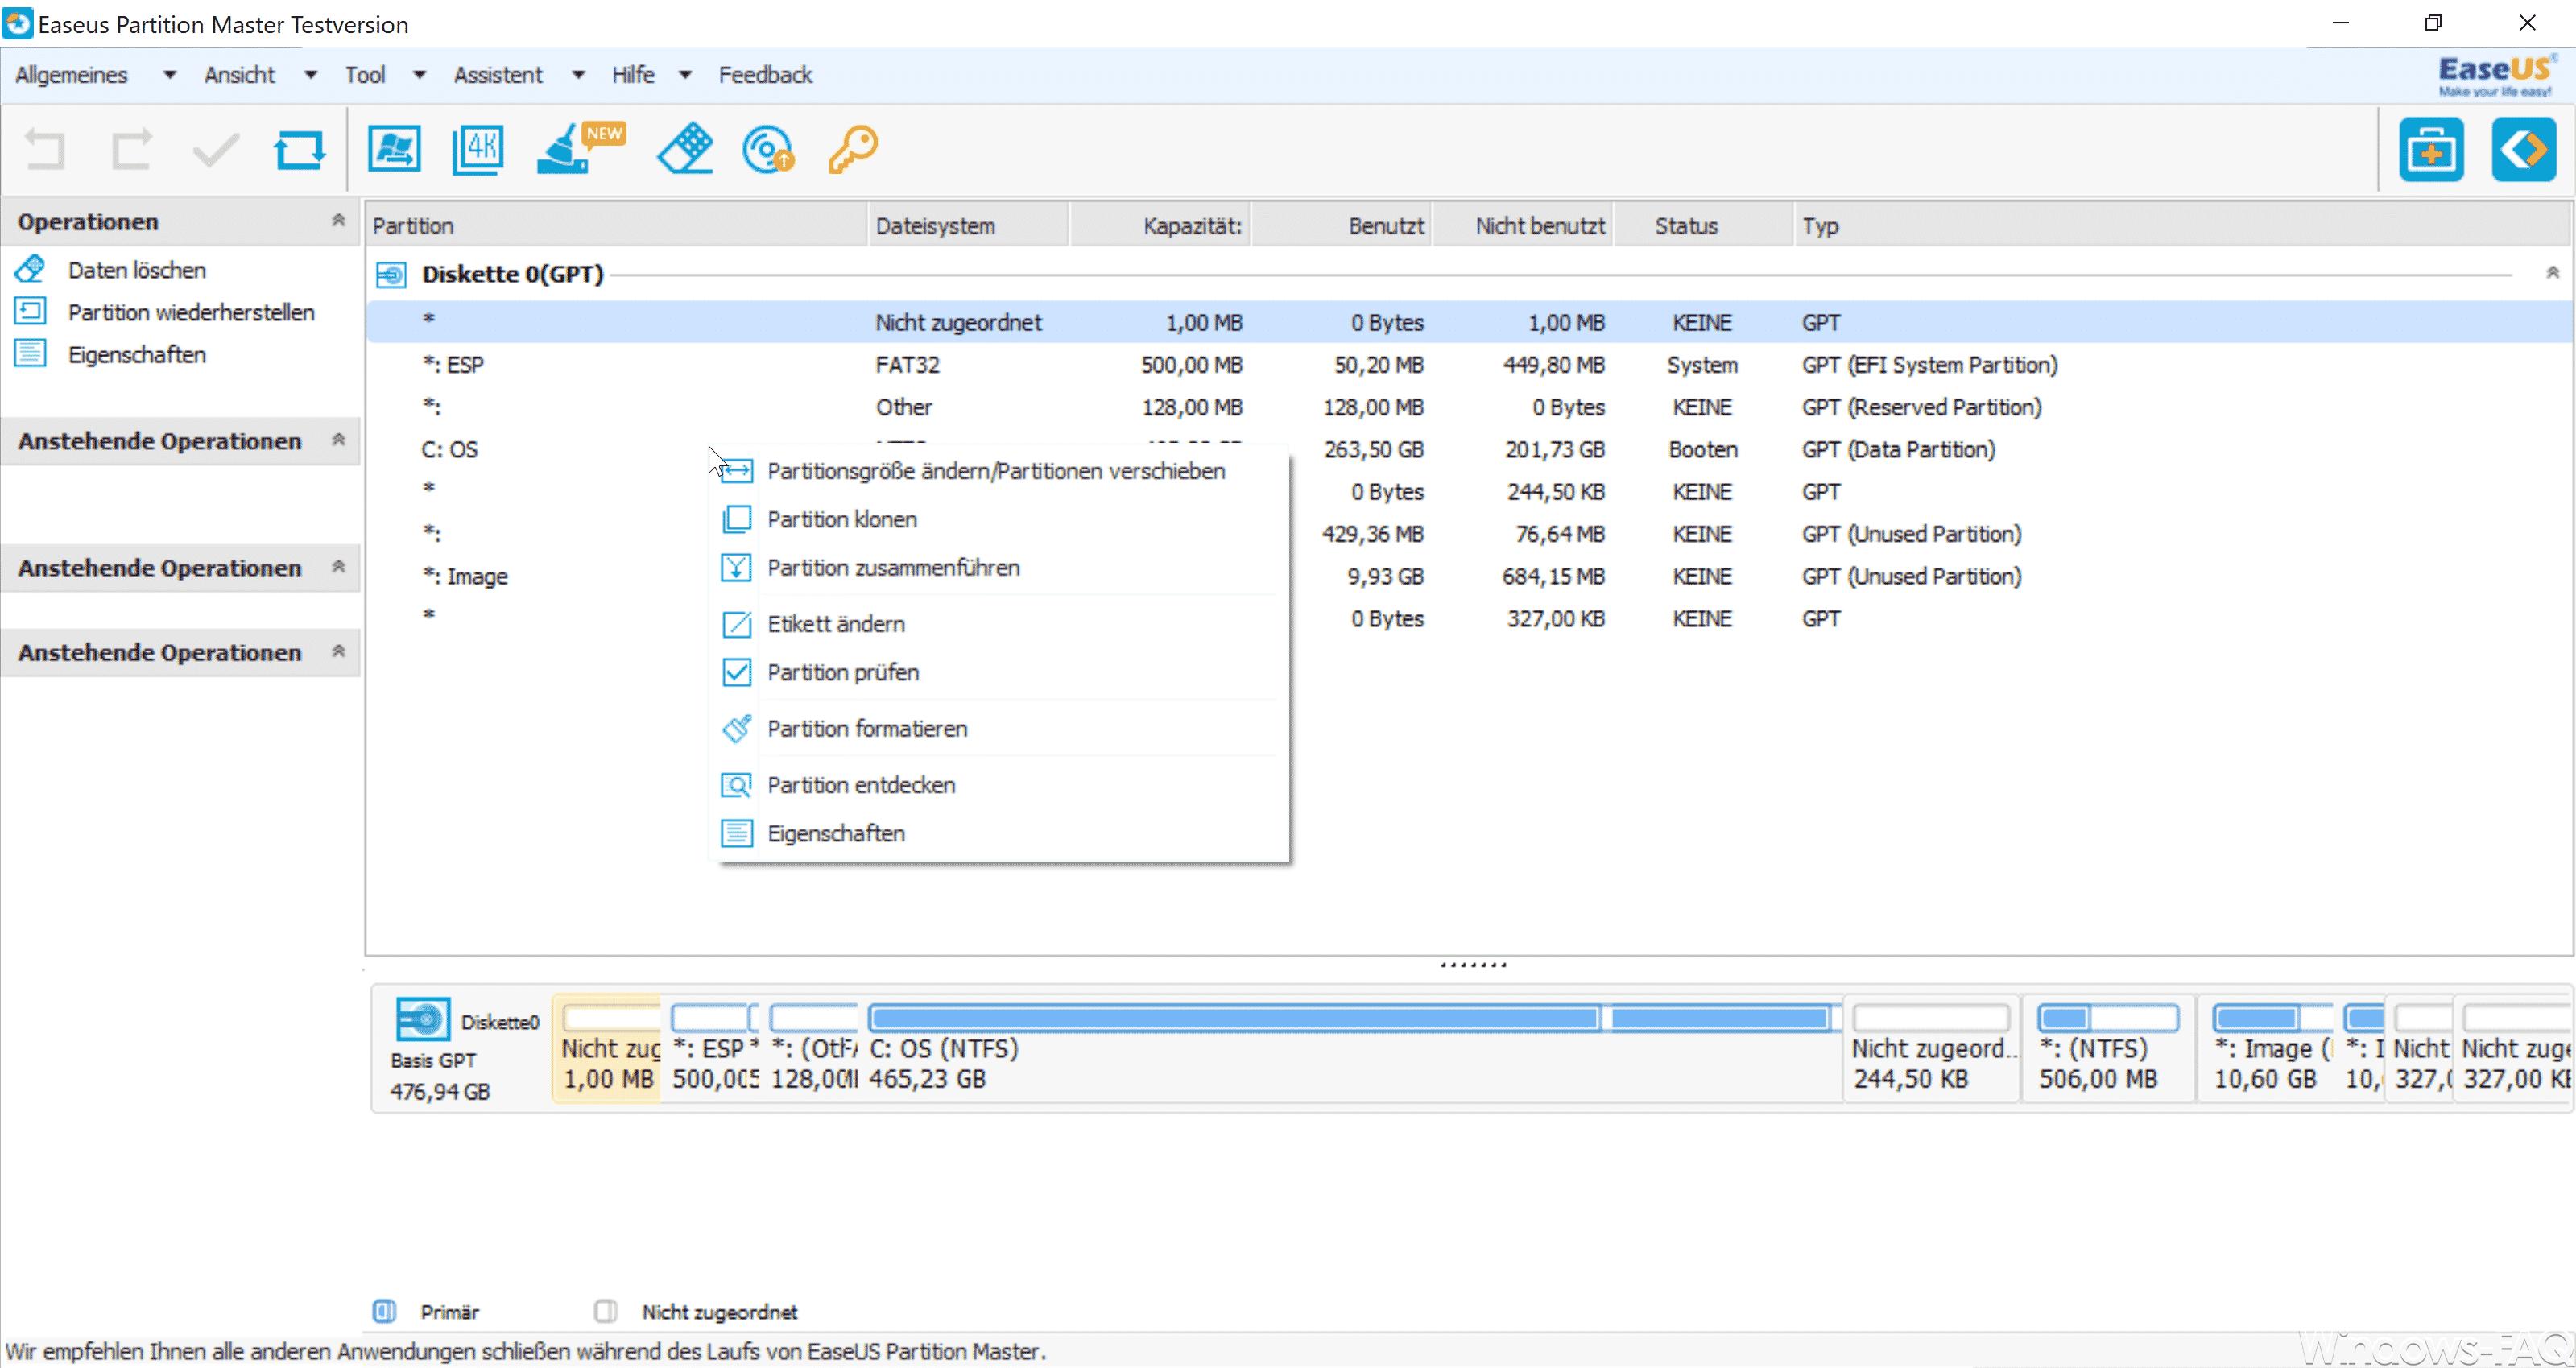 EaseUS Partition Master 12.9 Features